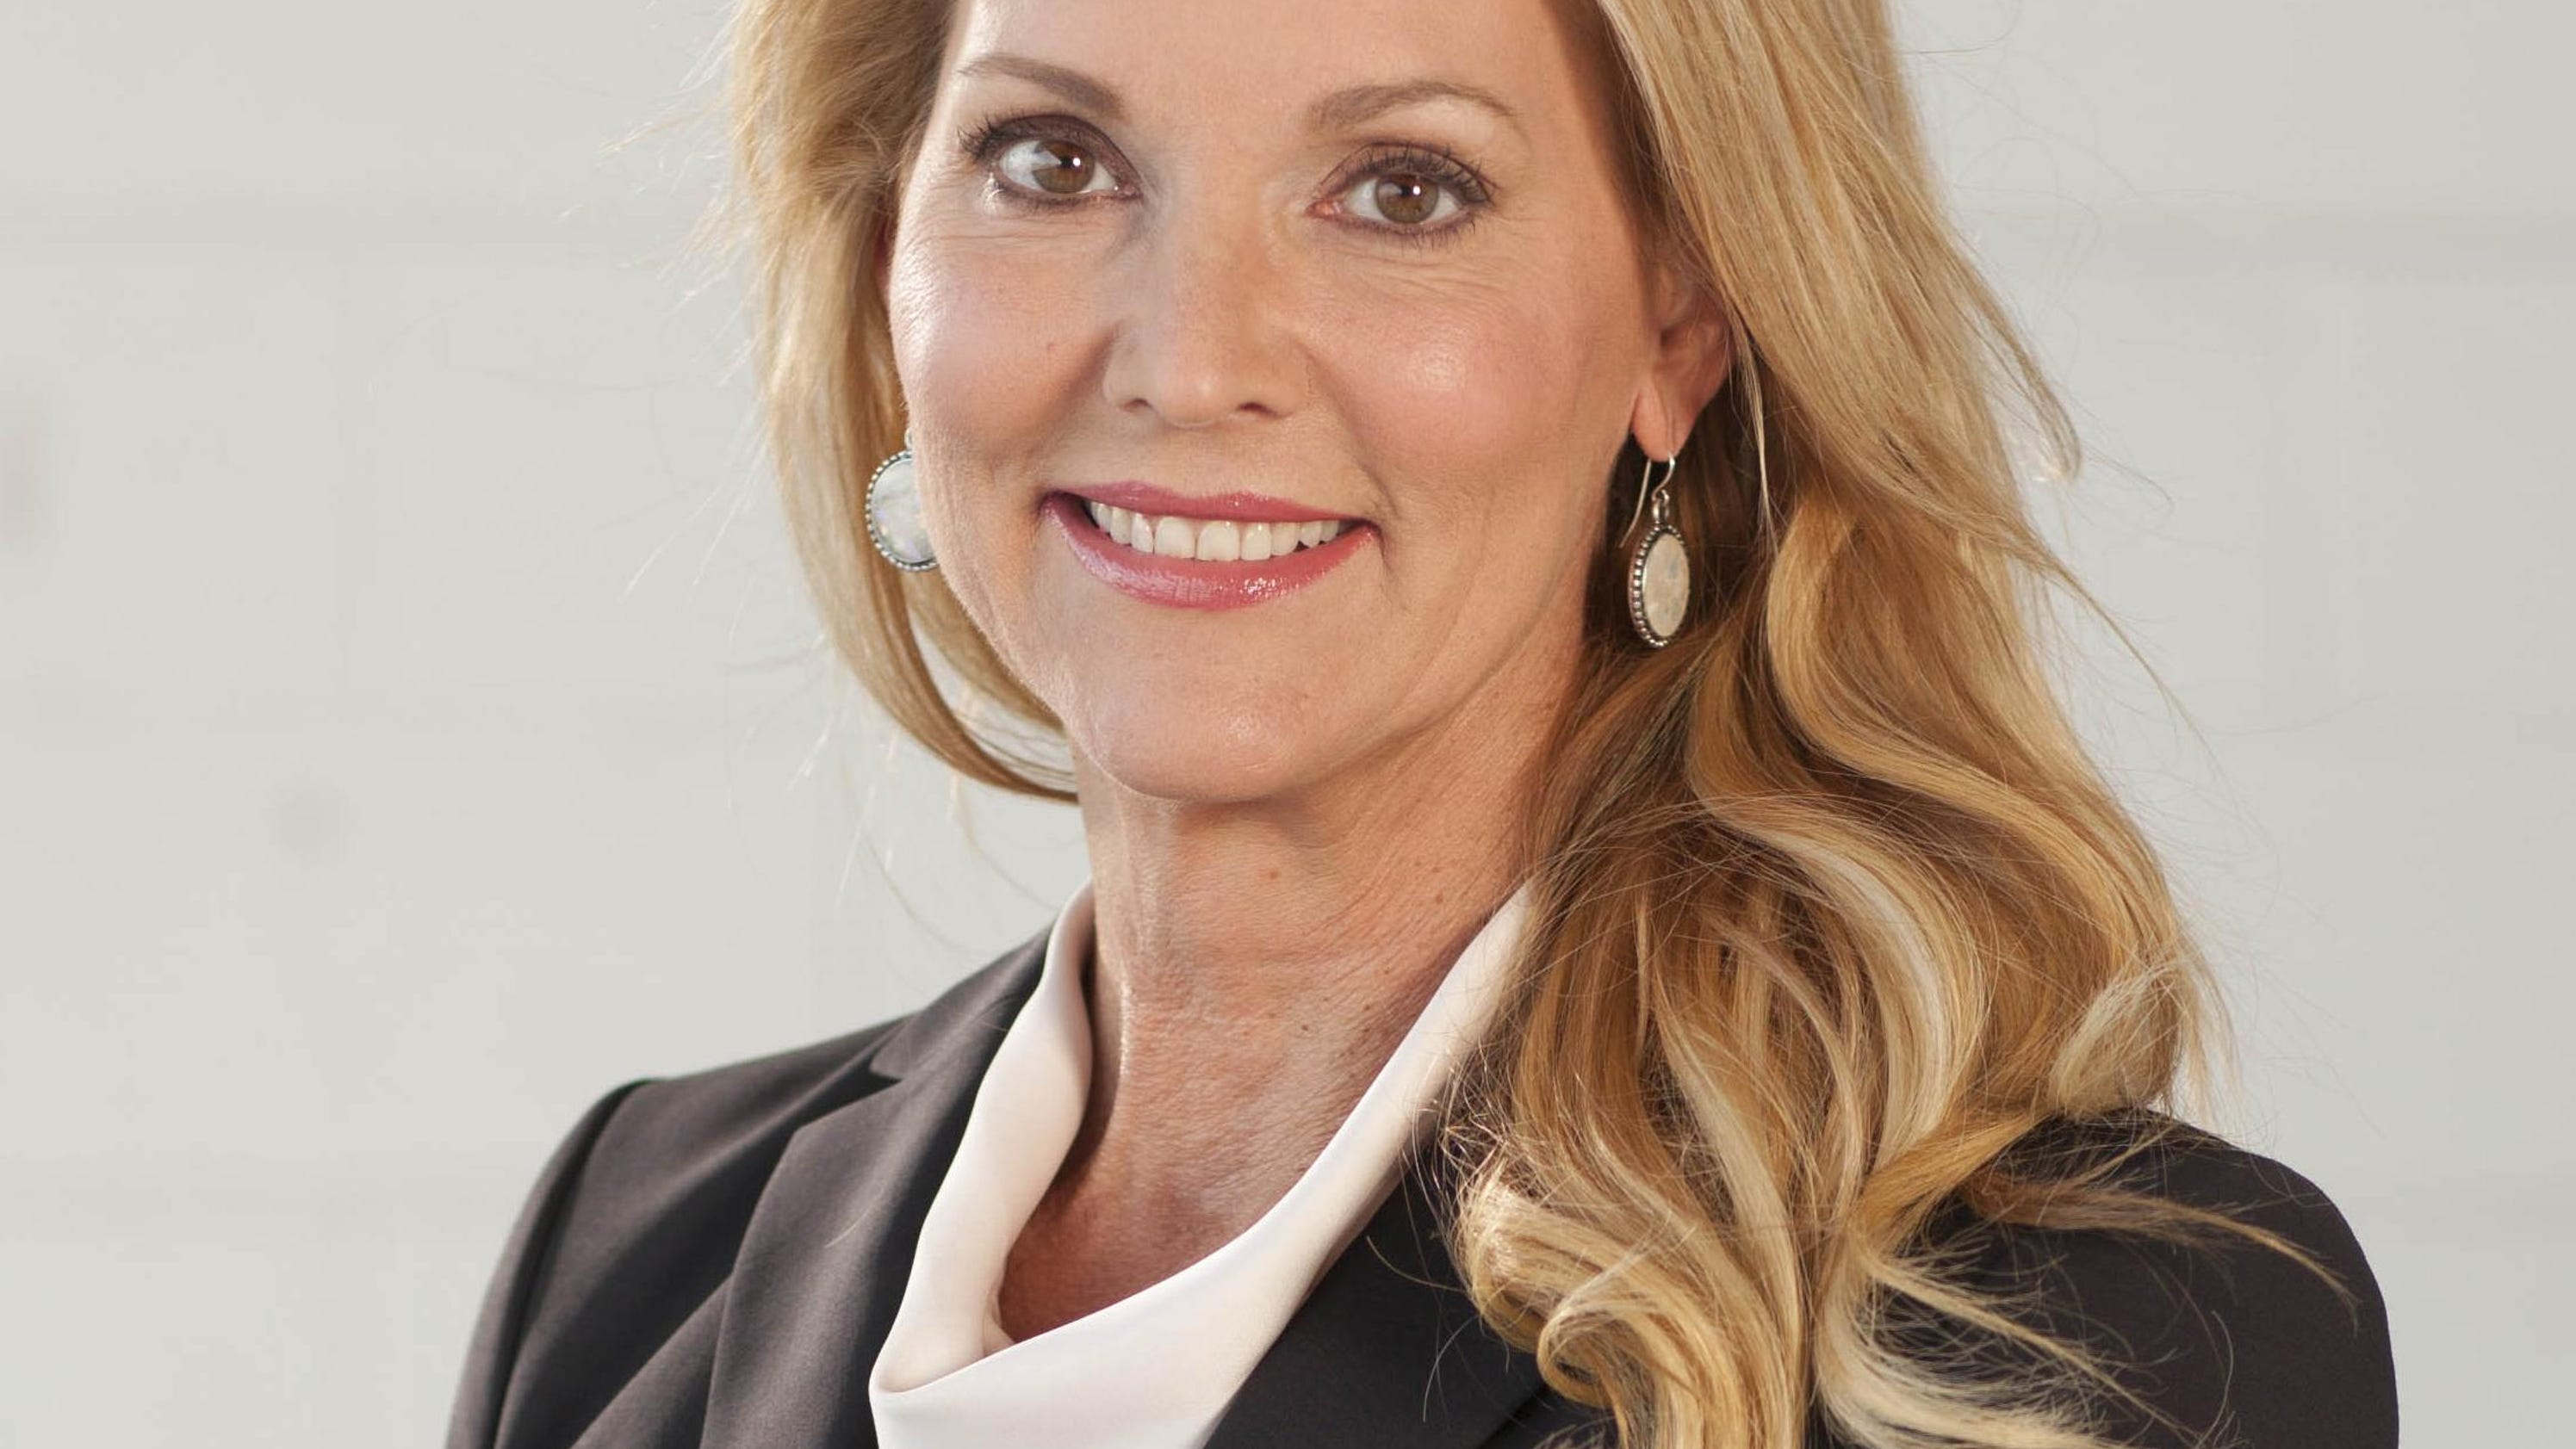 Local CEO wins international peace award